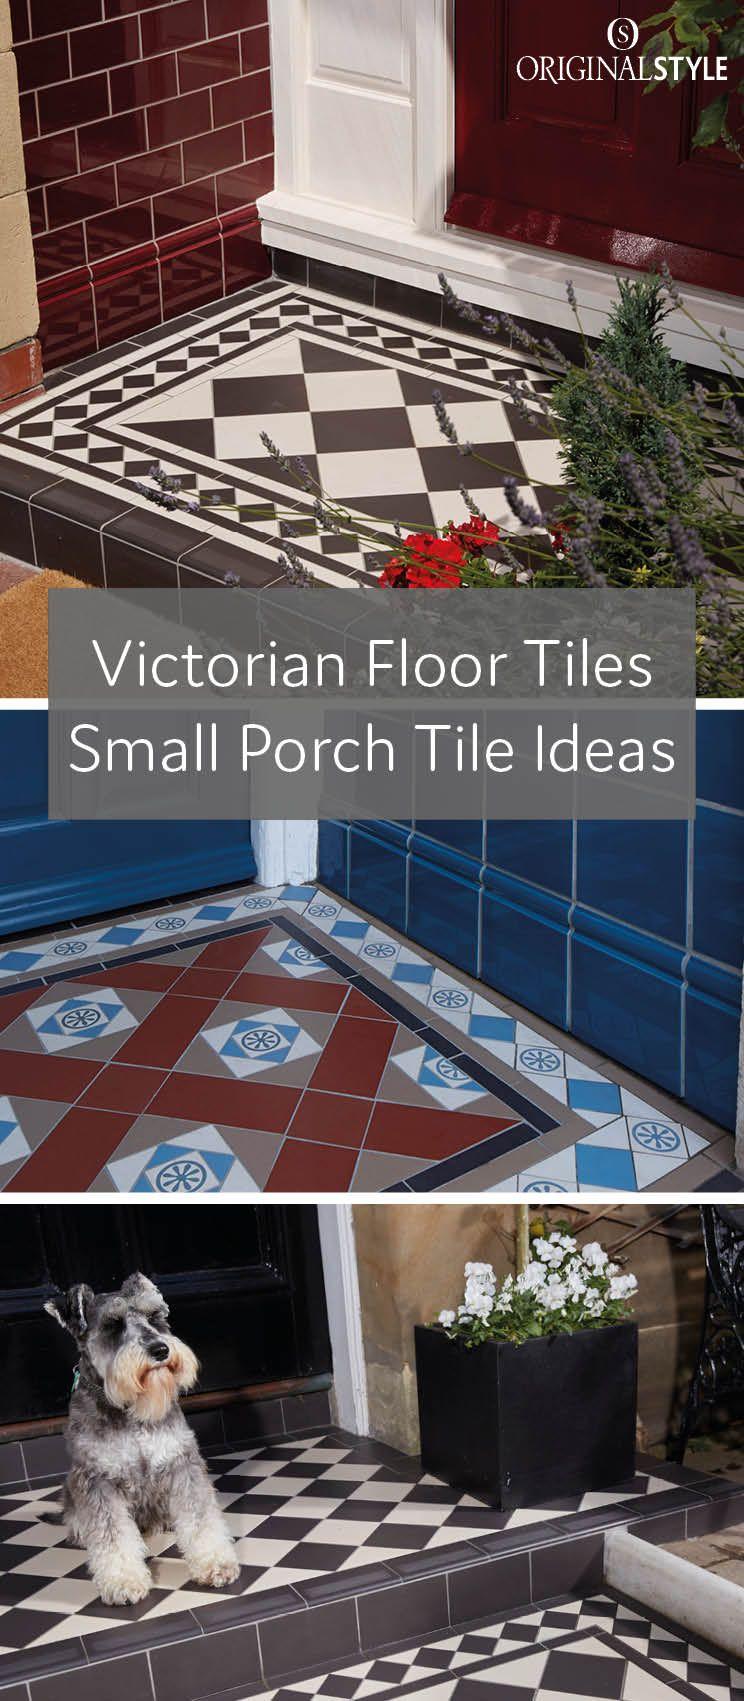 Pleasing Victorian Floor Tiles Small Porch Tile Ideas Home Victorian Largest Home Design Picture Inspirations Pitcheantrous